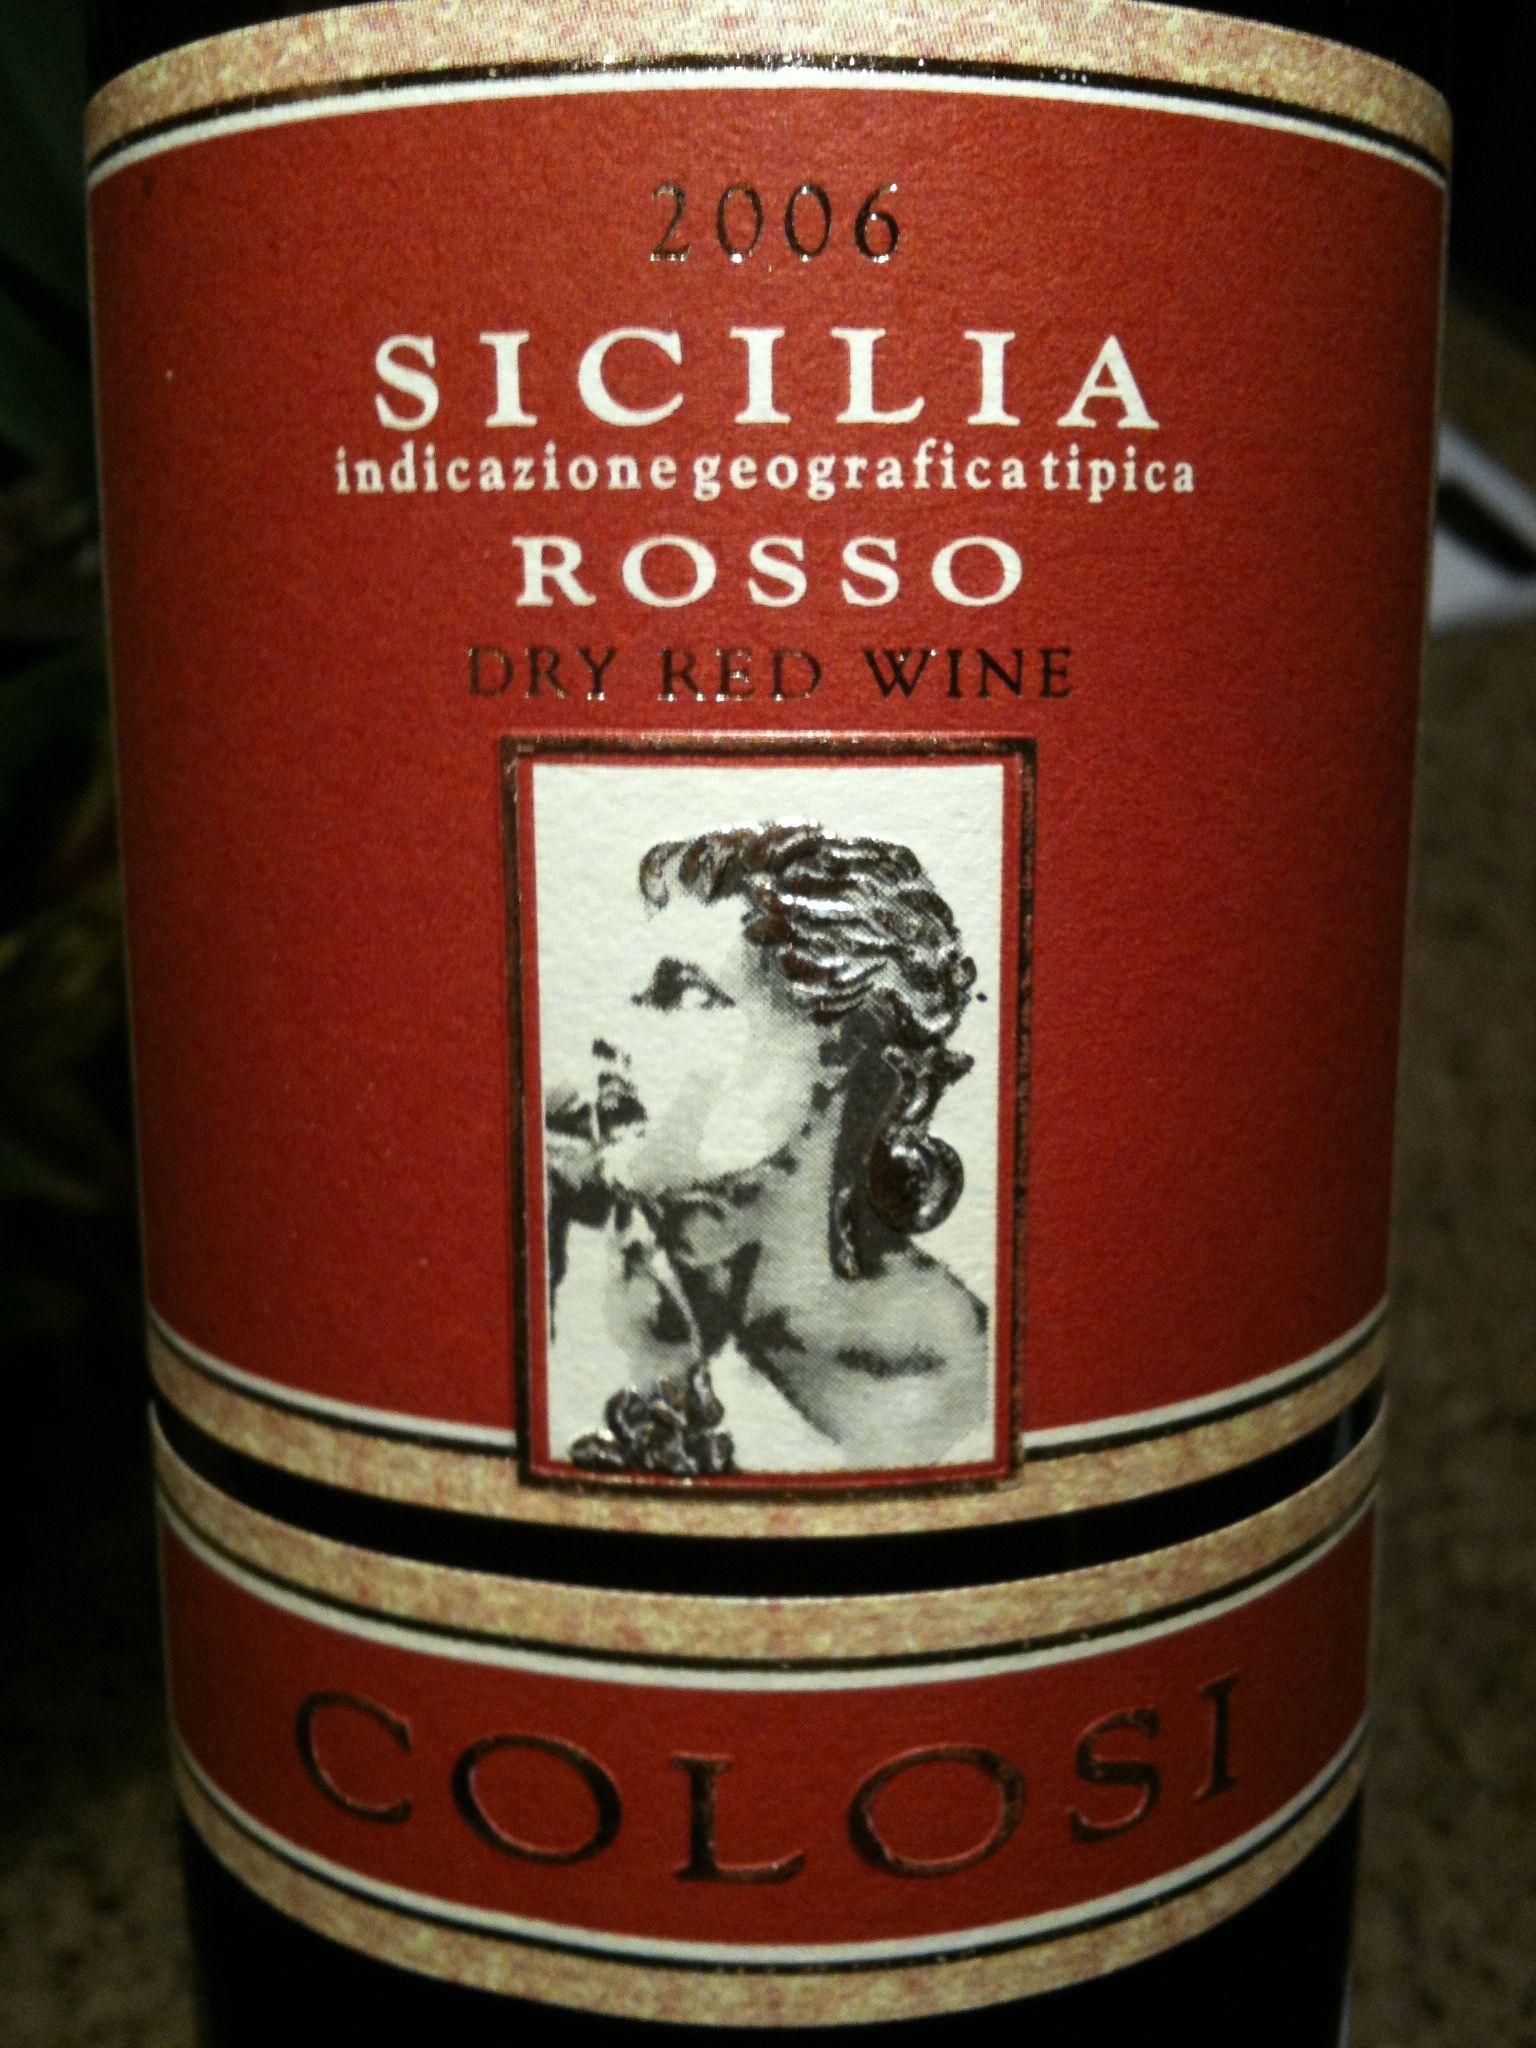 Colosi 2006 Rosso Sicilia Wine Bottle Dry Red Wine Rose Wine Bottle